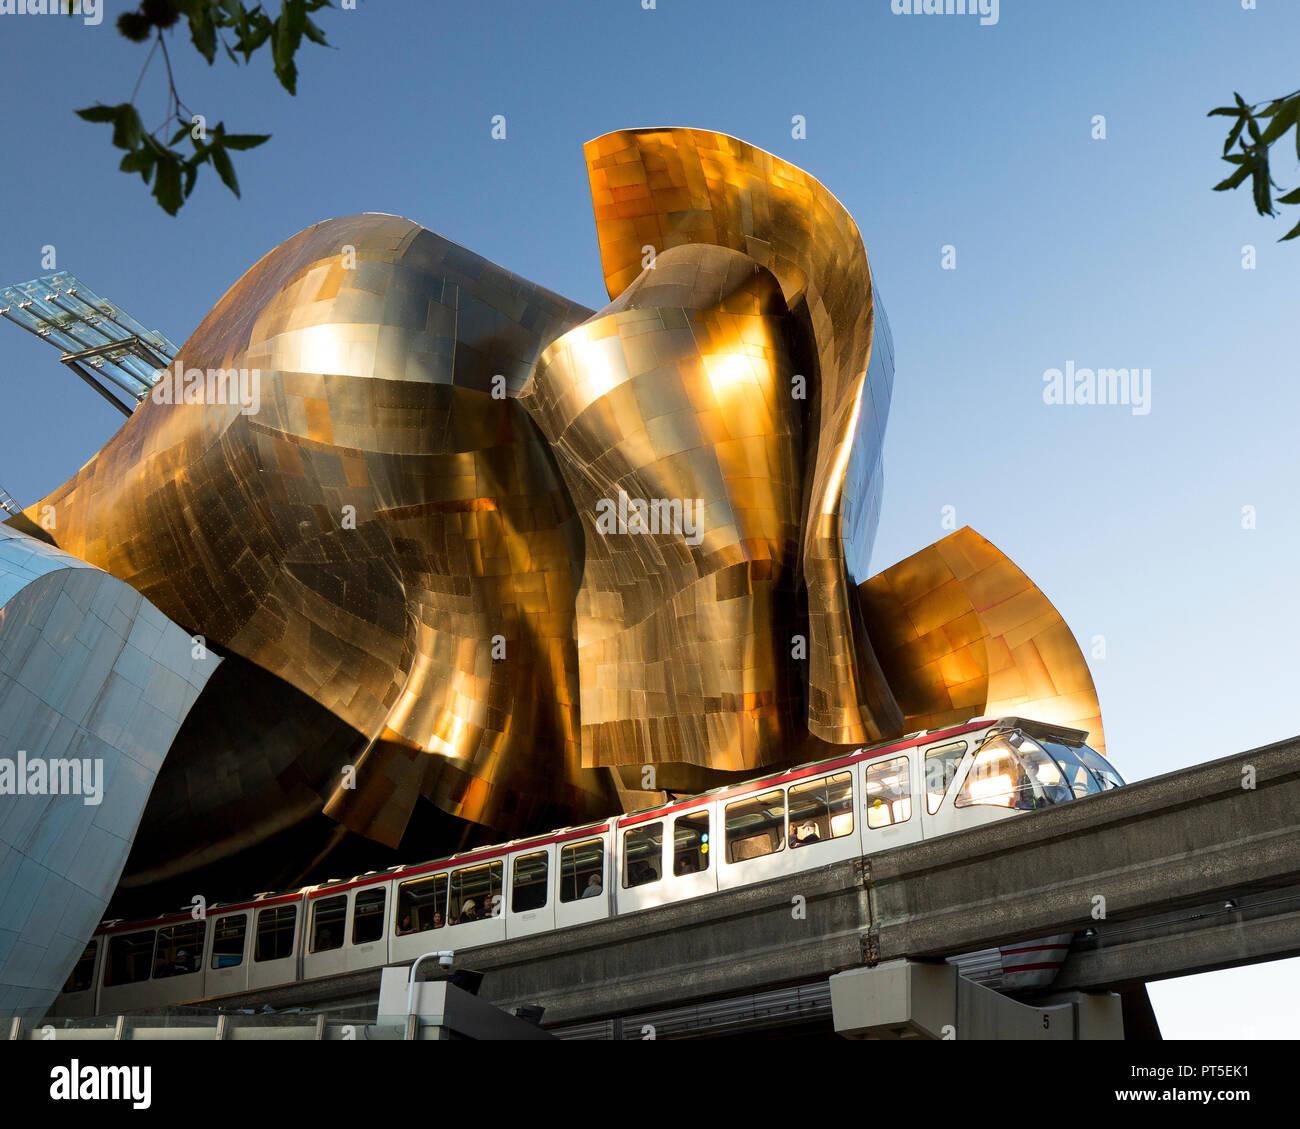 Con MoPOP monorail seattle, Museo de la cultura pop. Imagen De Stock